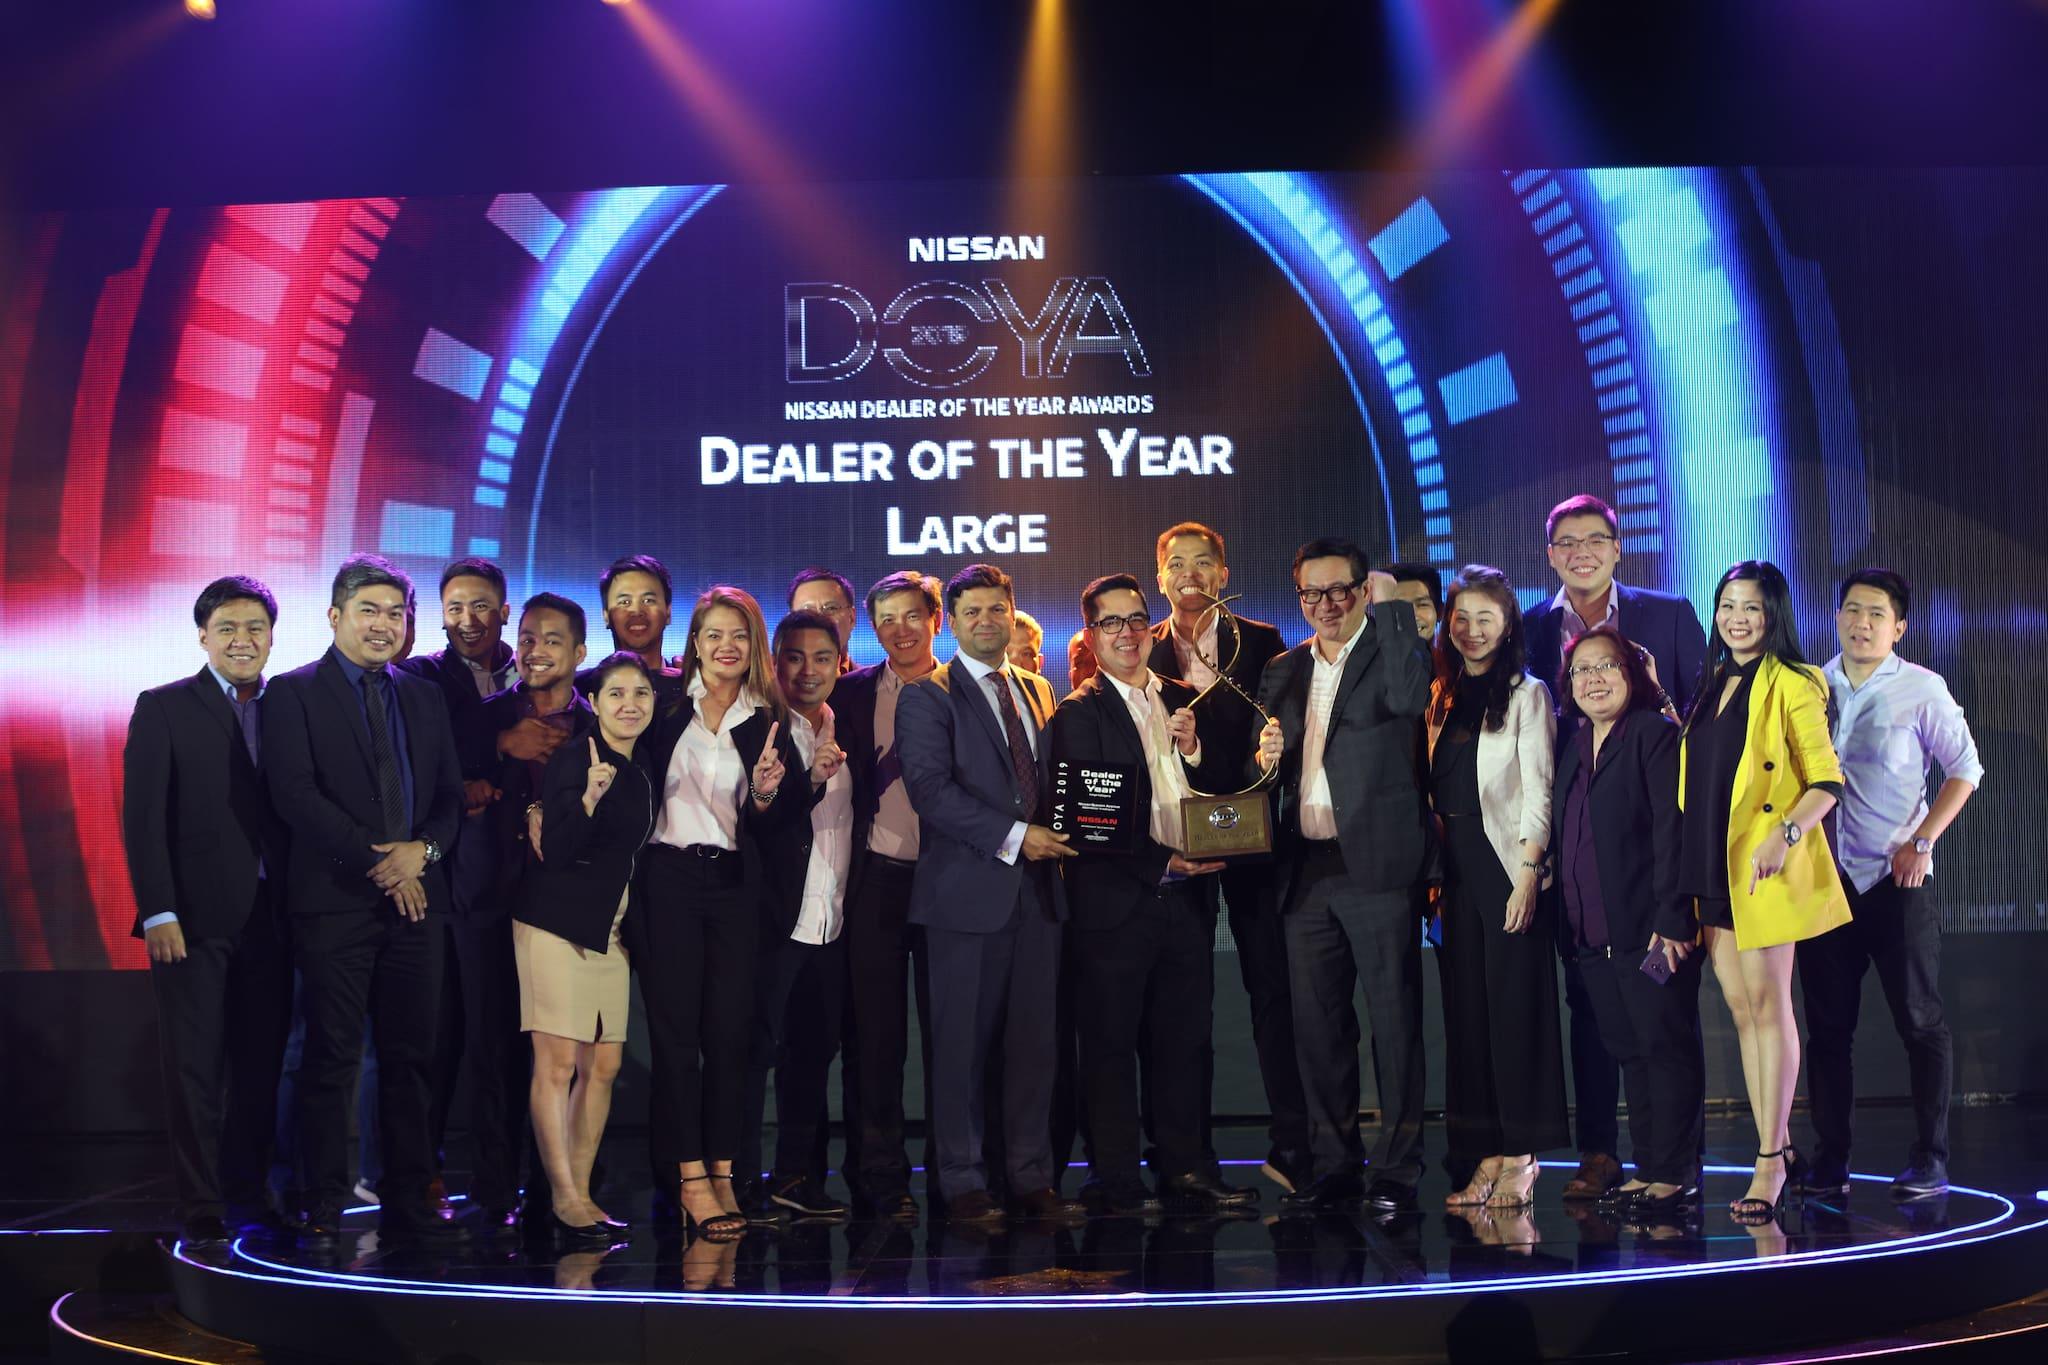 Nissan Quezon Avenue, Santa Rosa, Isabela Bag Nissan Dealer of the Year Awards